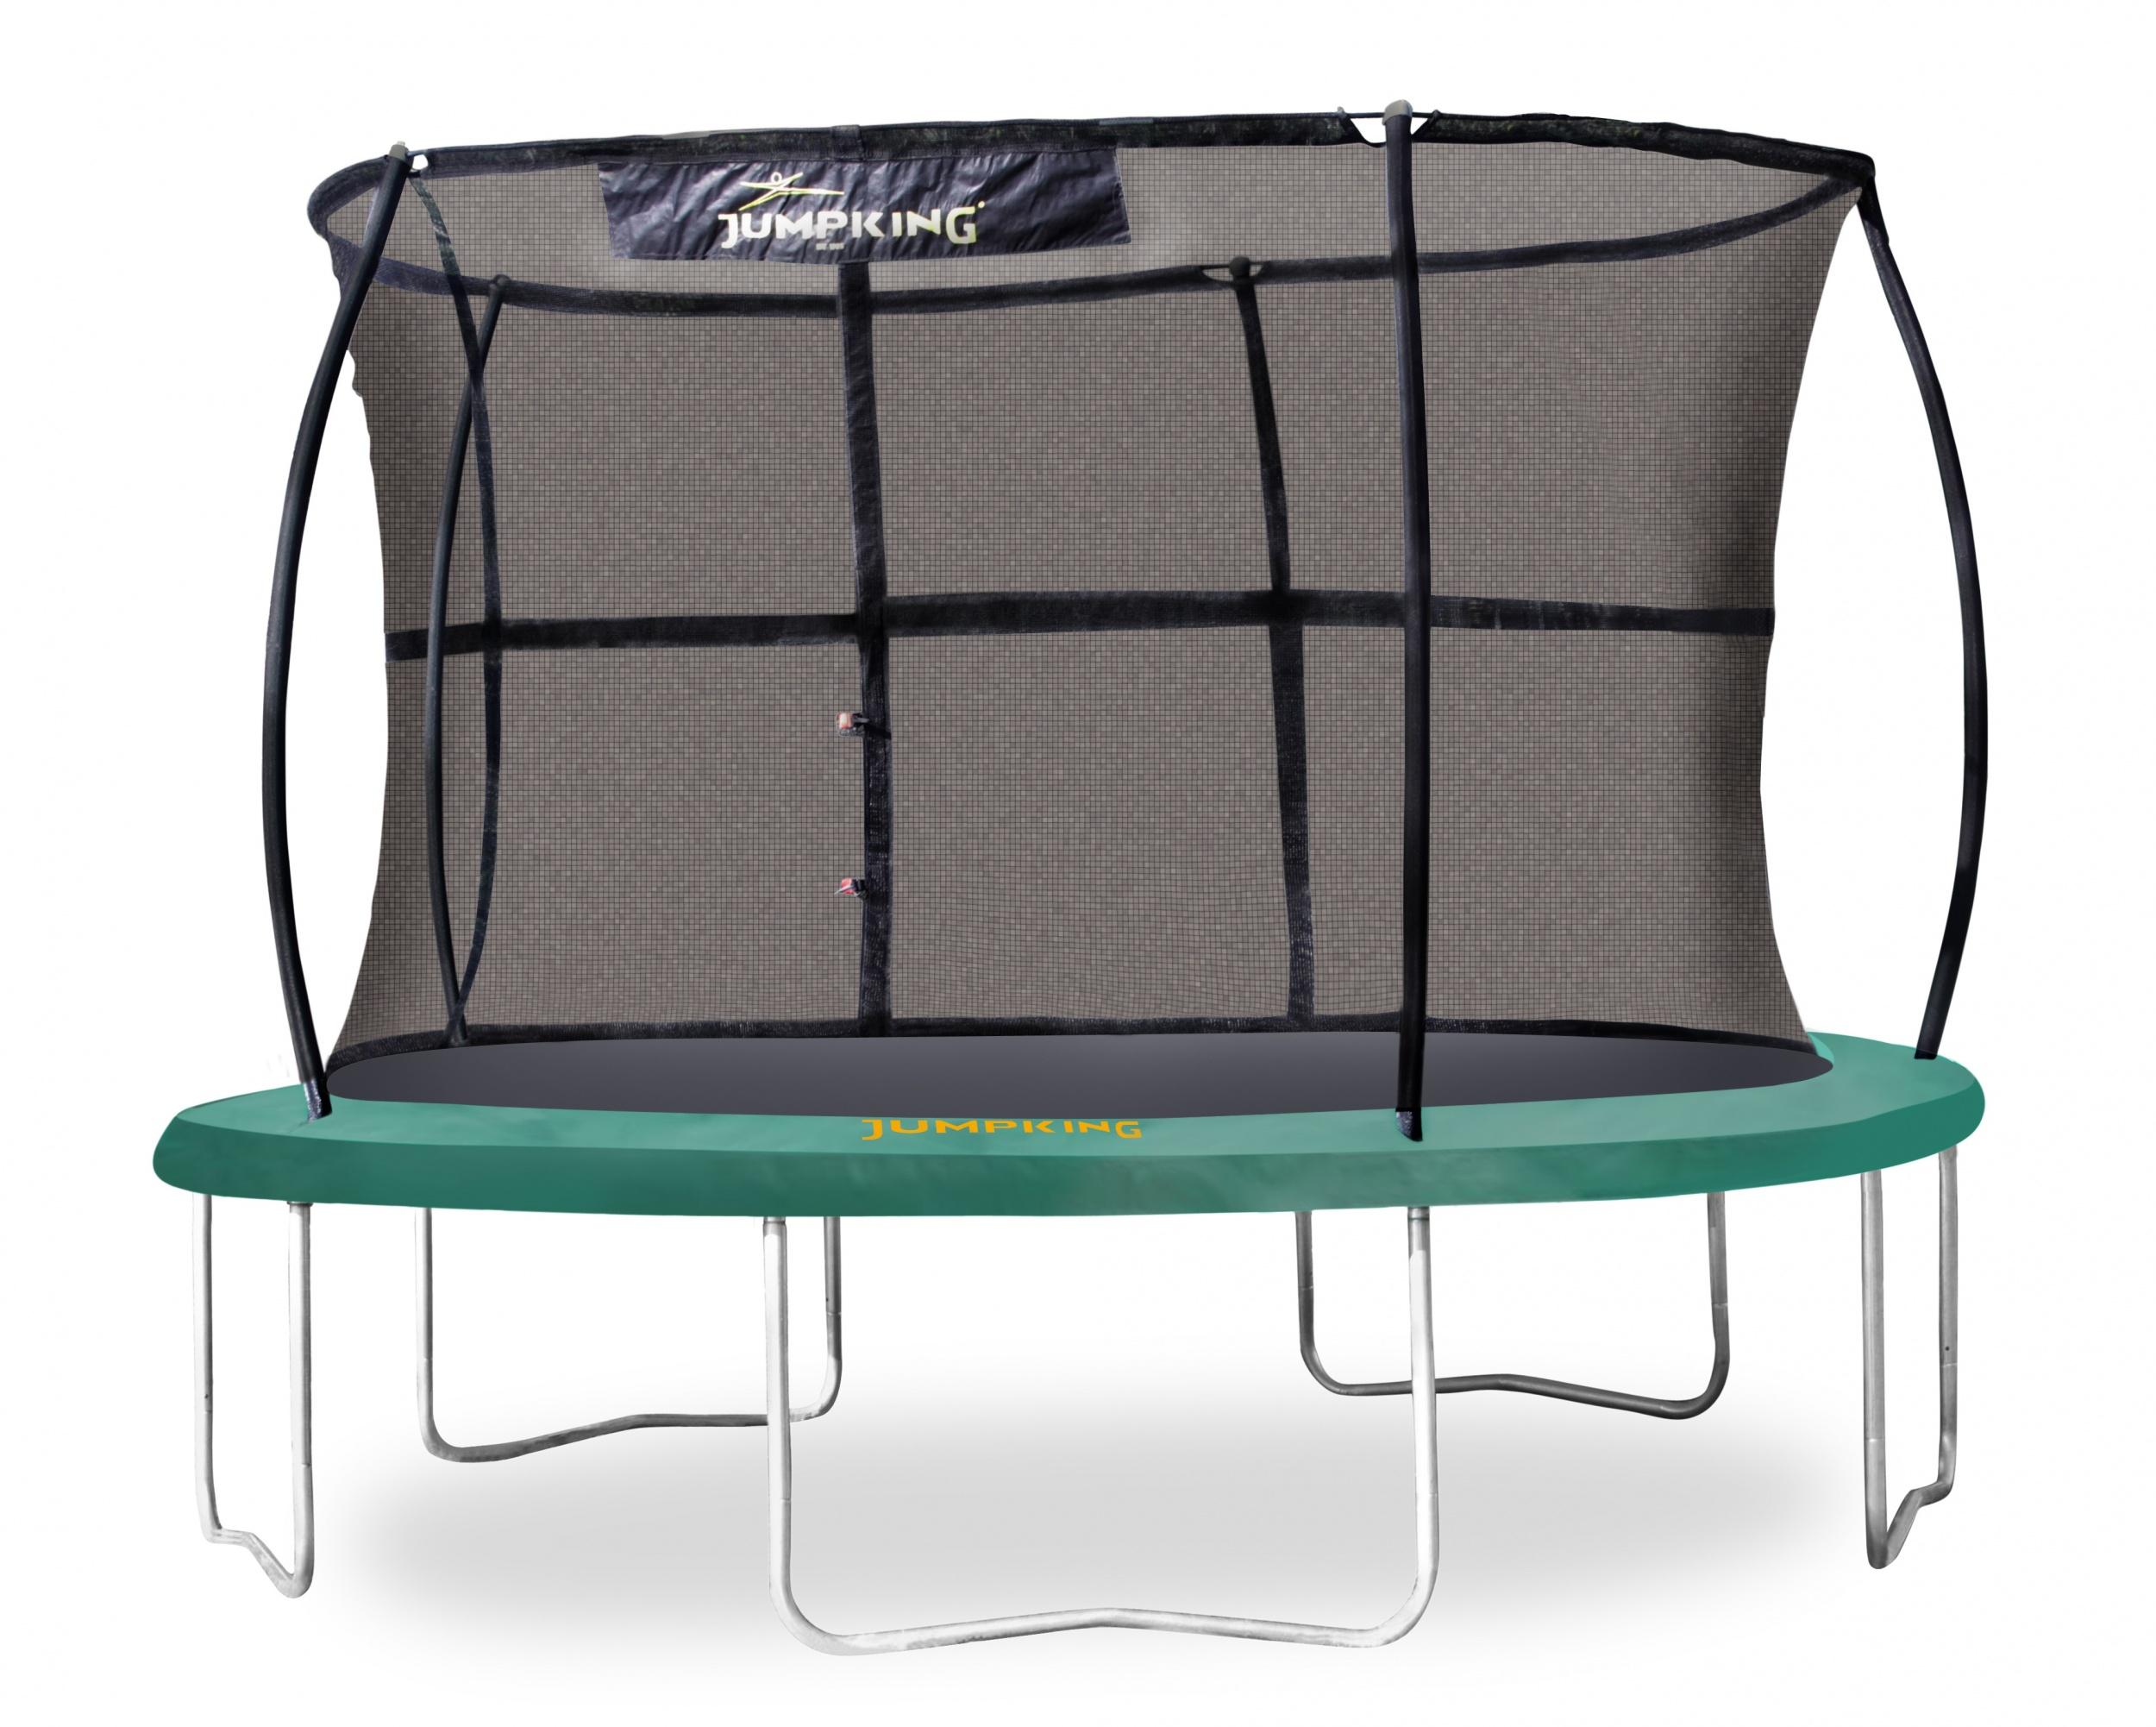 Jumpking trampolin mit JumpPod ClassicSicherheitsnetz 366 cm grün